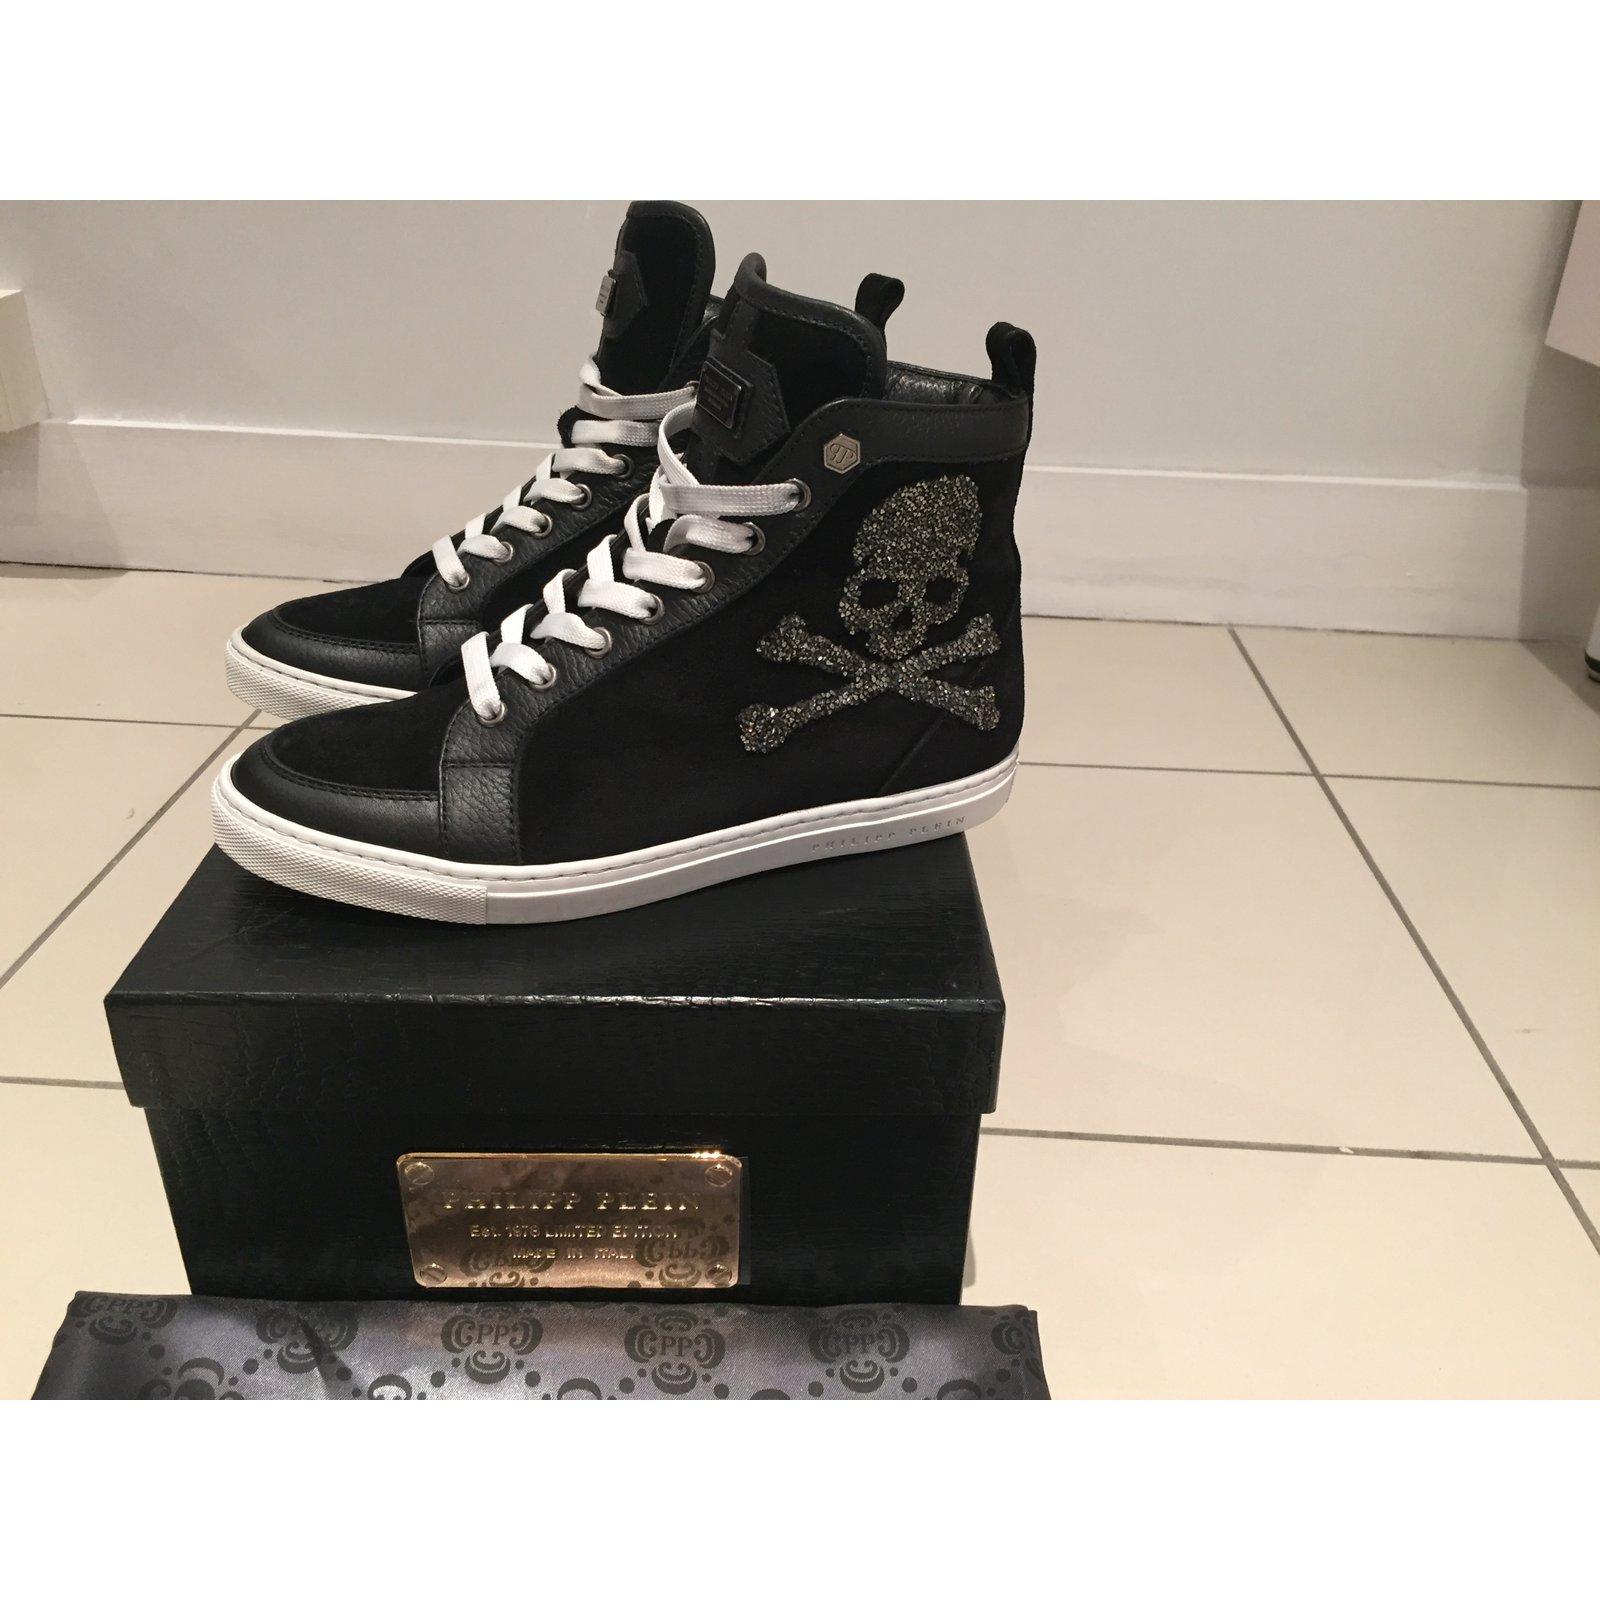 cf31697055 Philipp Plein Sneakers Sneakers Pony-style calfskin Black ref.8353 - Joli  Closet